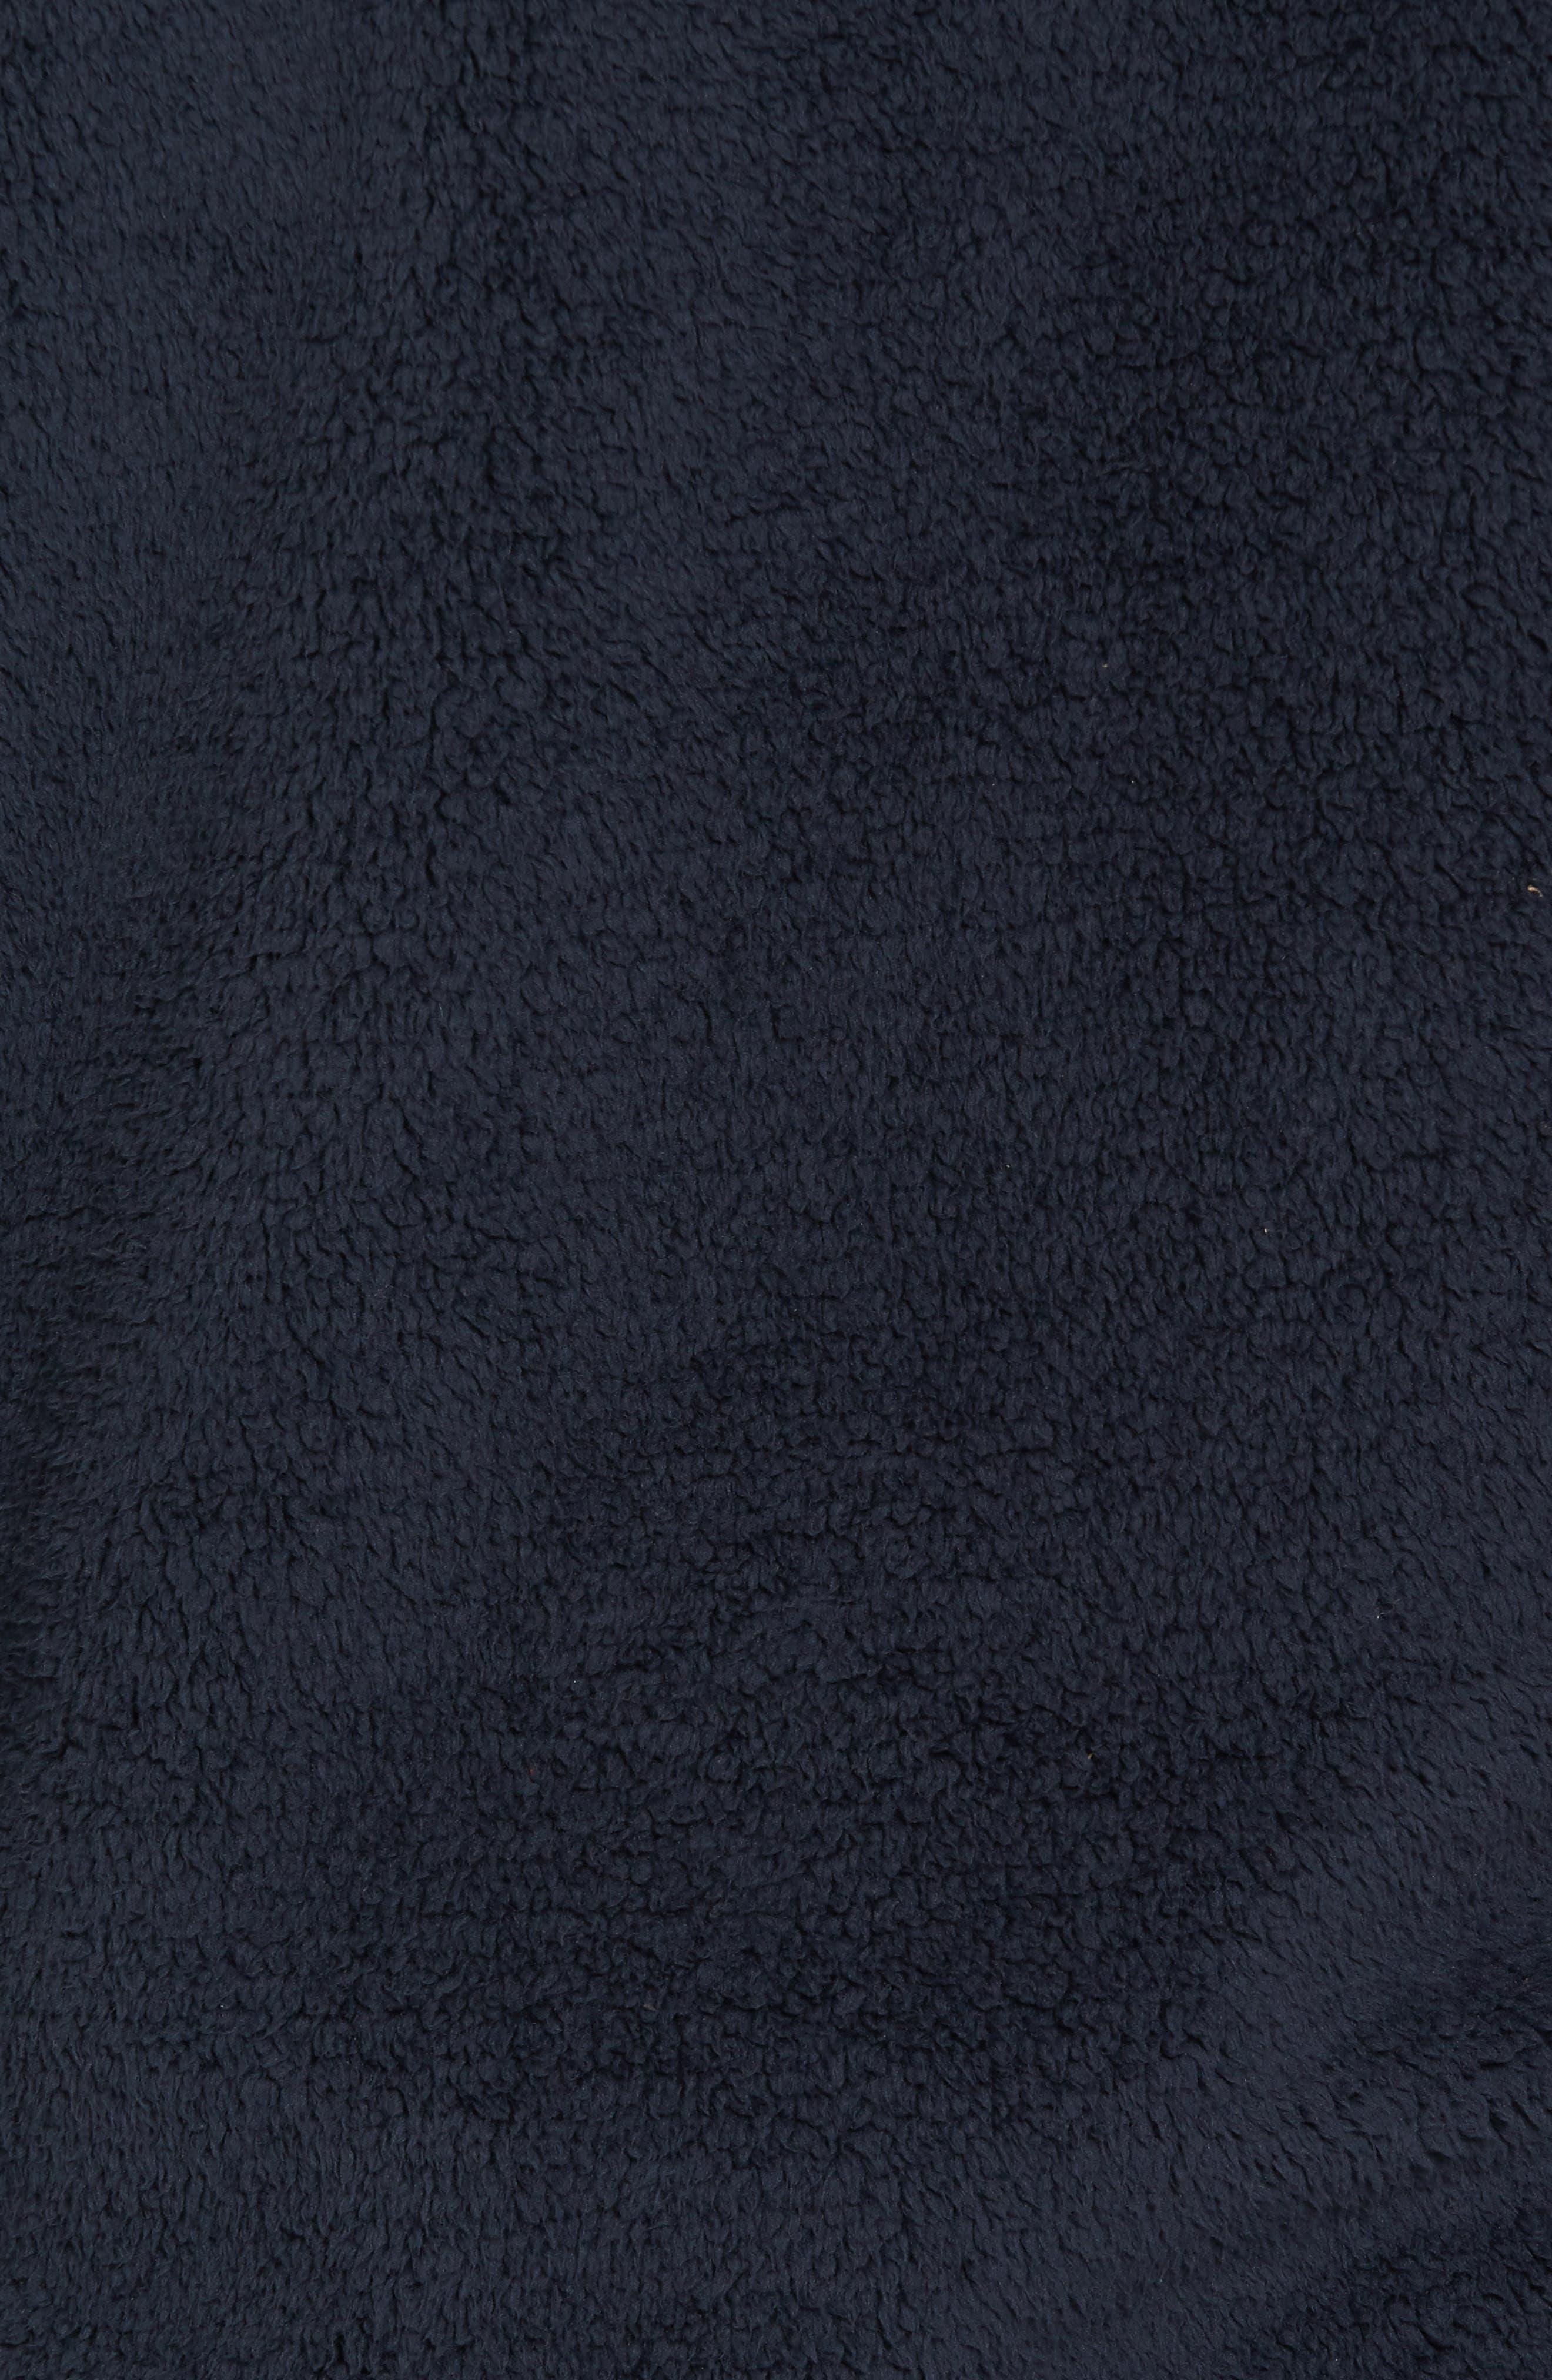 Campshire Zip Fleece Jacket,                             Alternate thumbnail 49, color,